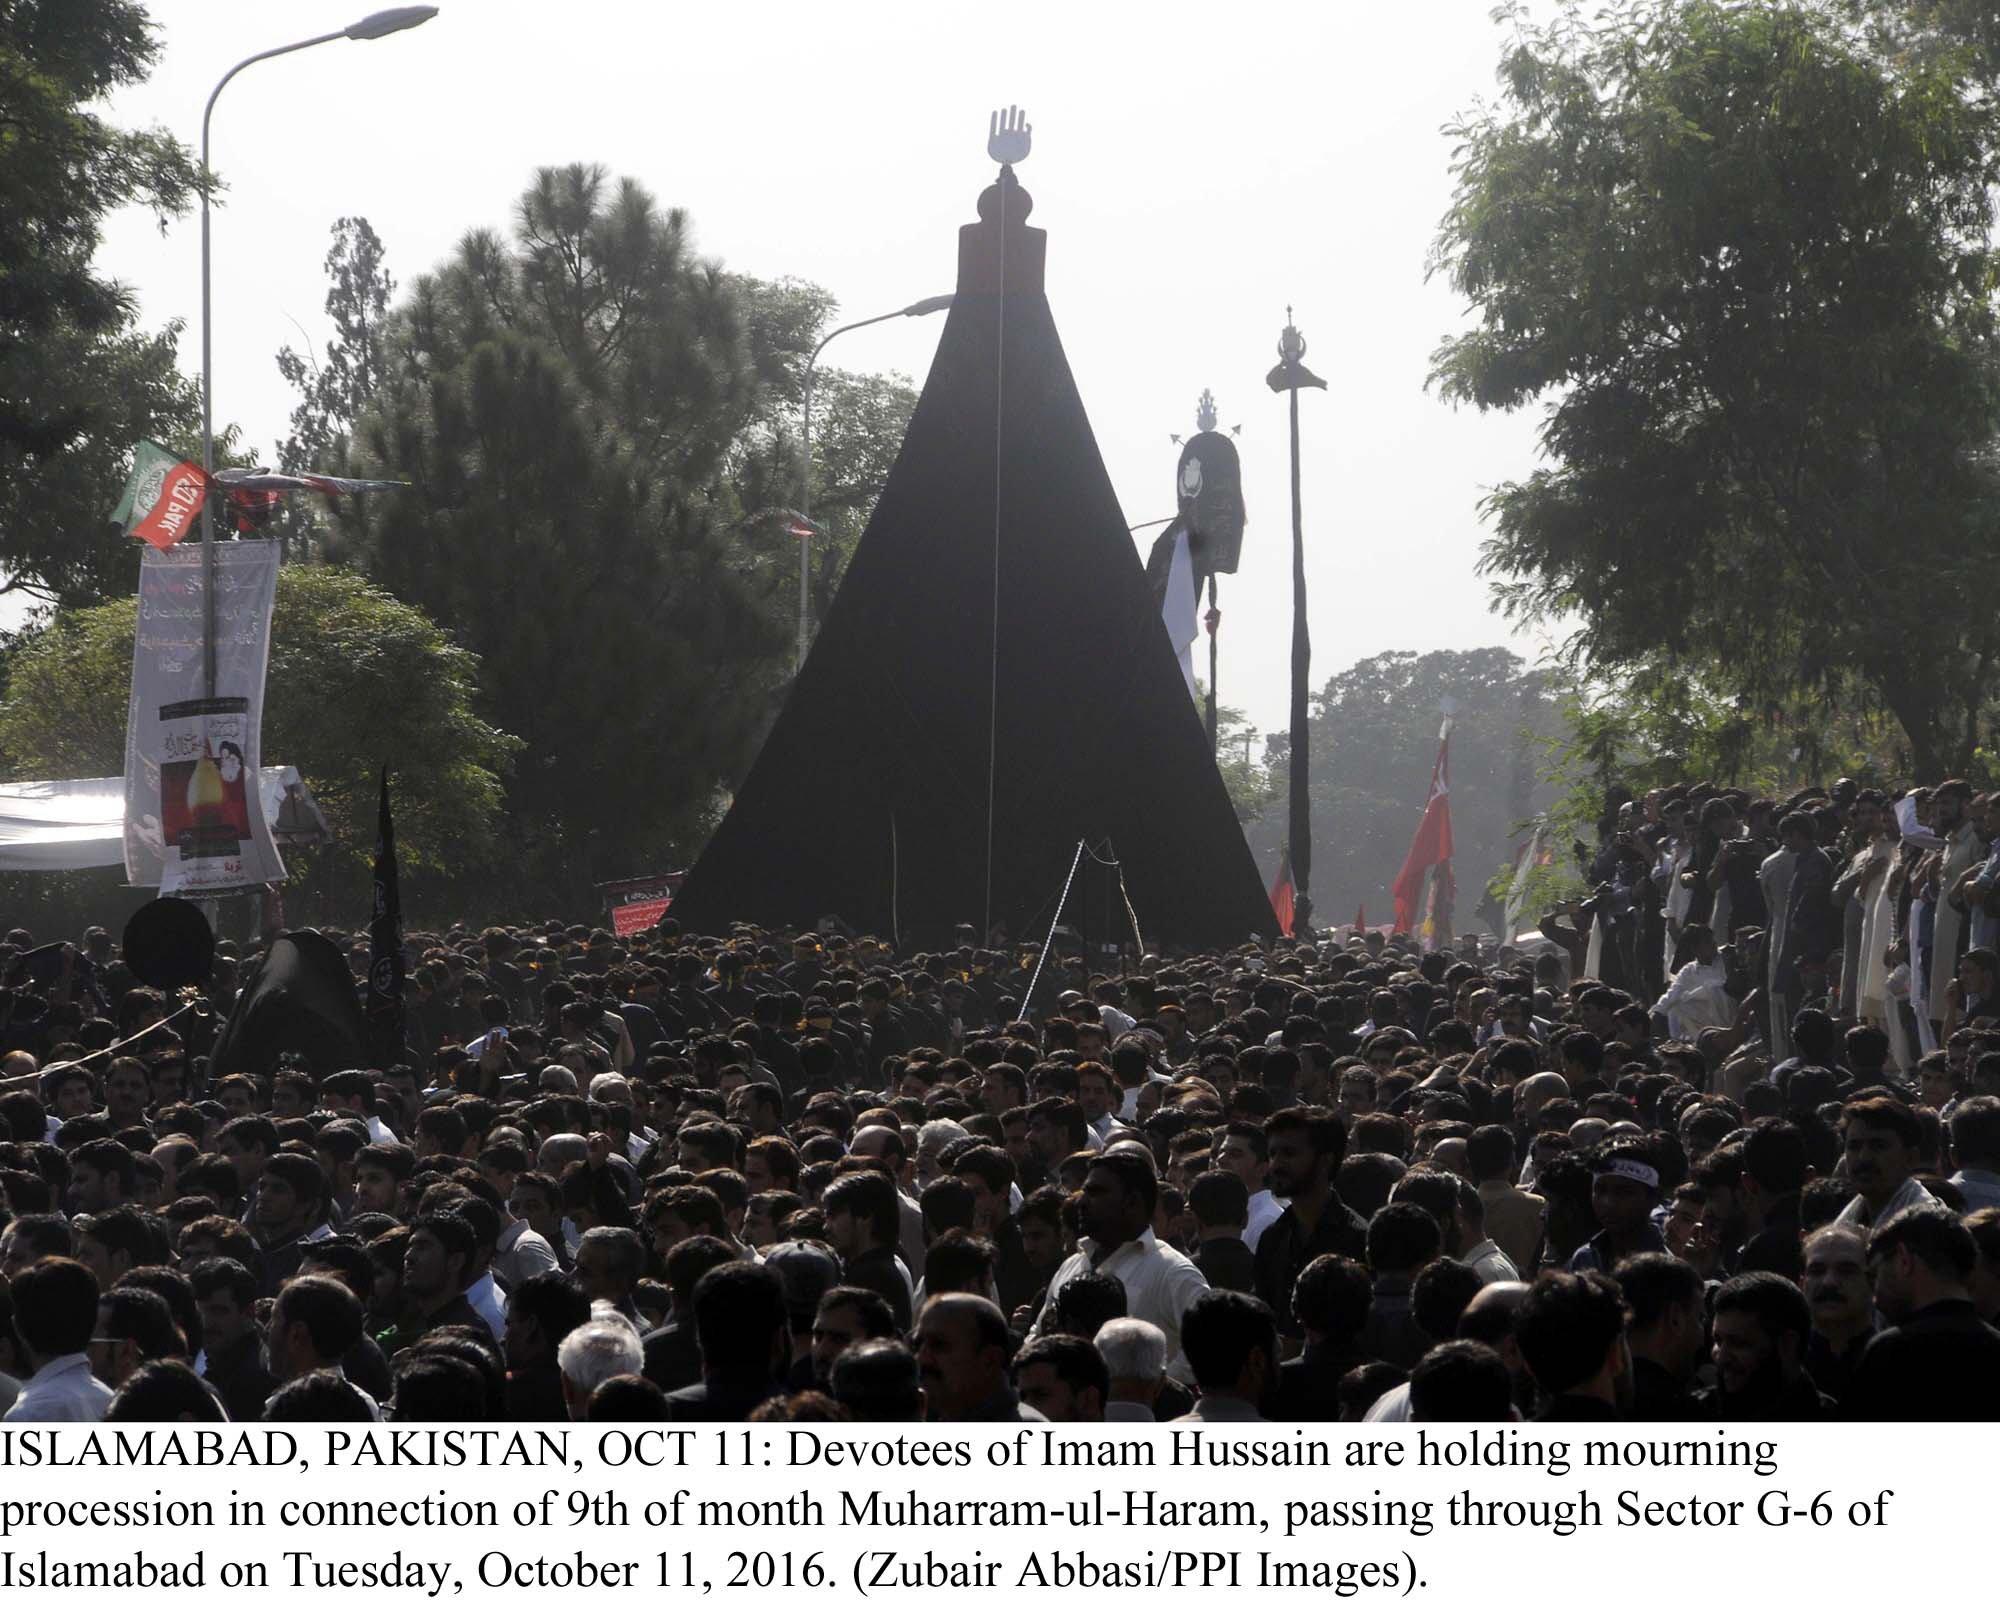 aerial surveillance drones keep watch over processions in ajk hazara division